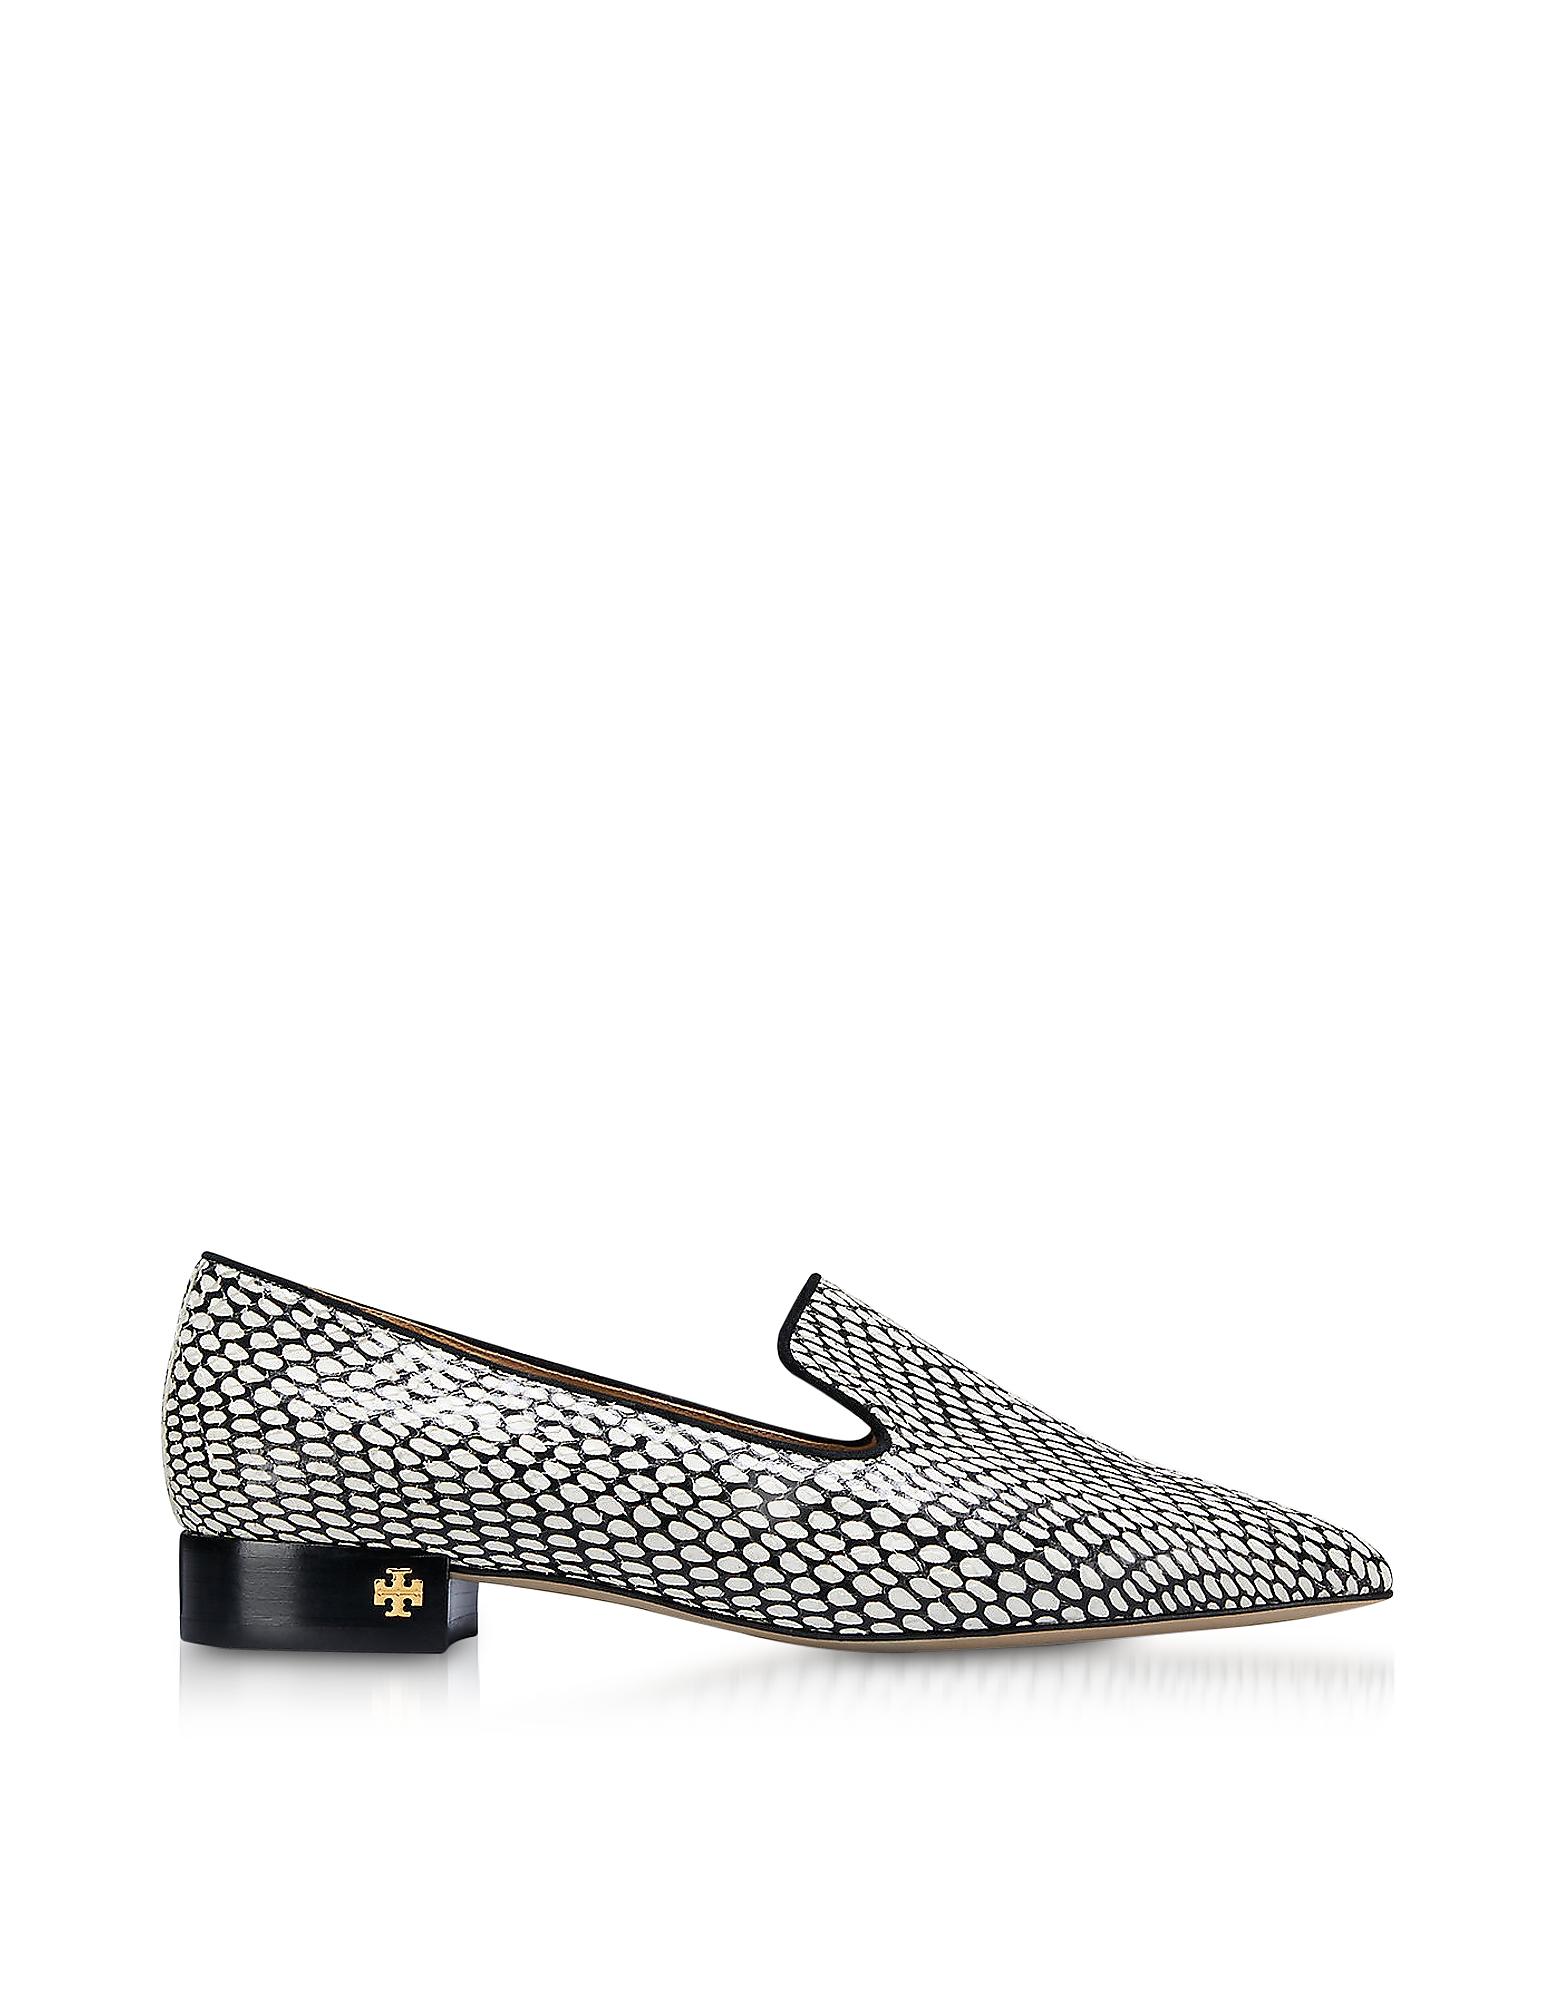 Tory Burch Shoes, King Cobra Pascal Smoking Slippers